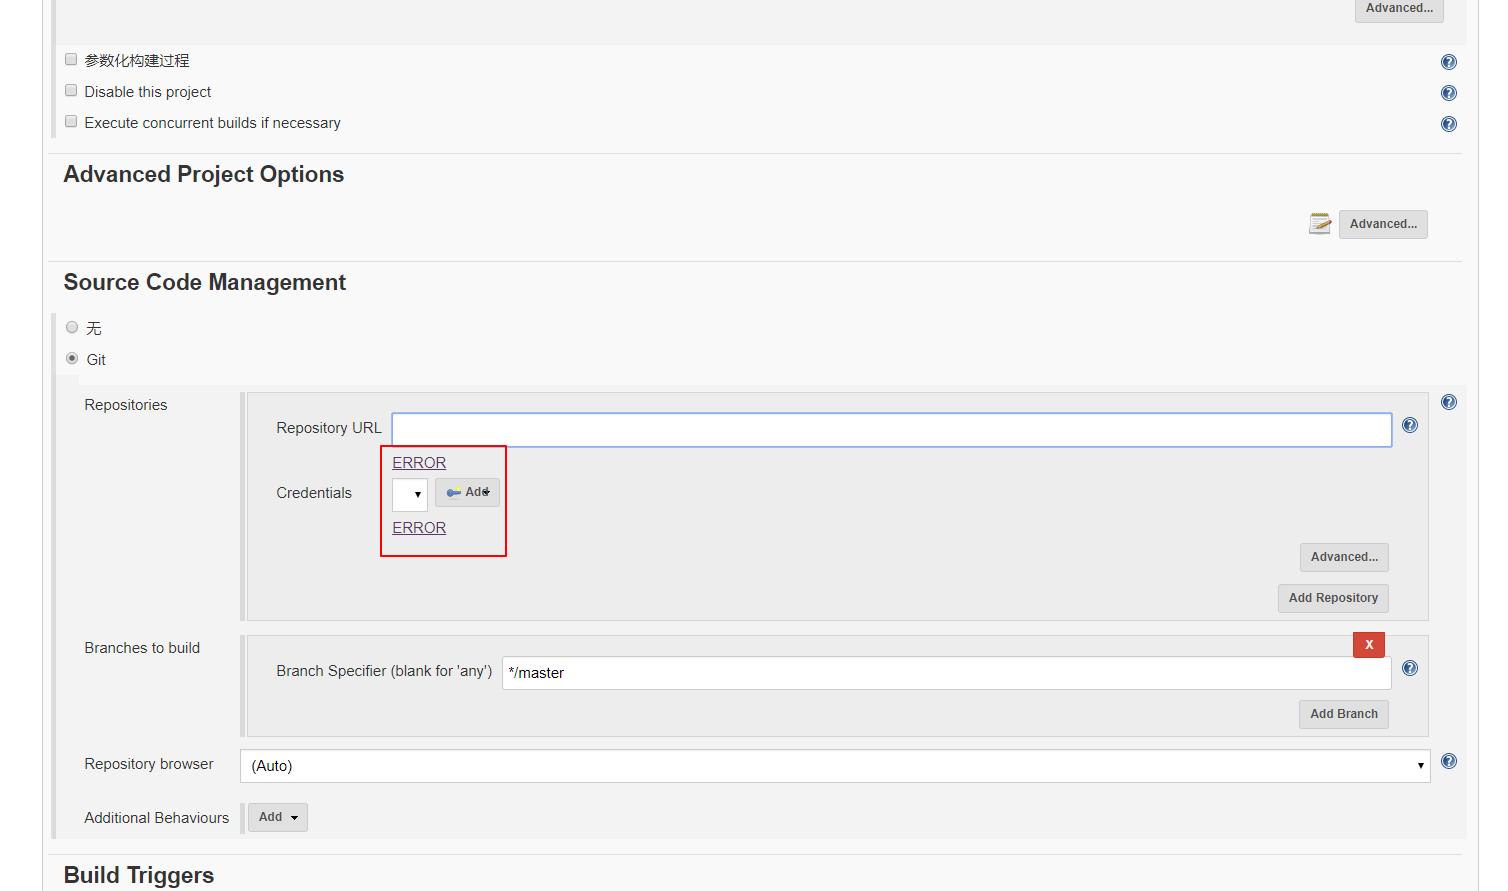 JENKINS-56192] Cannot run project when using Git SCM